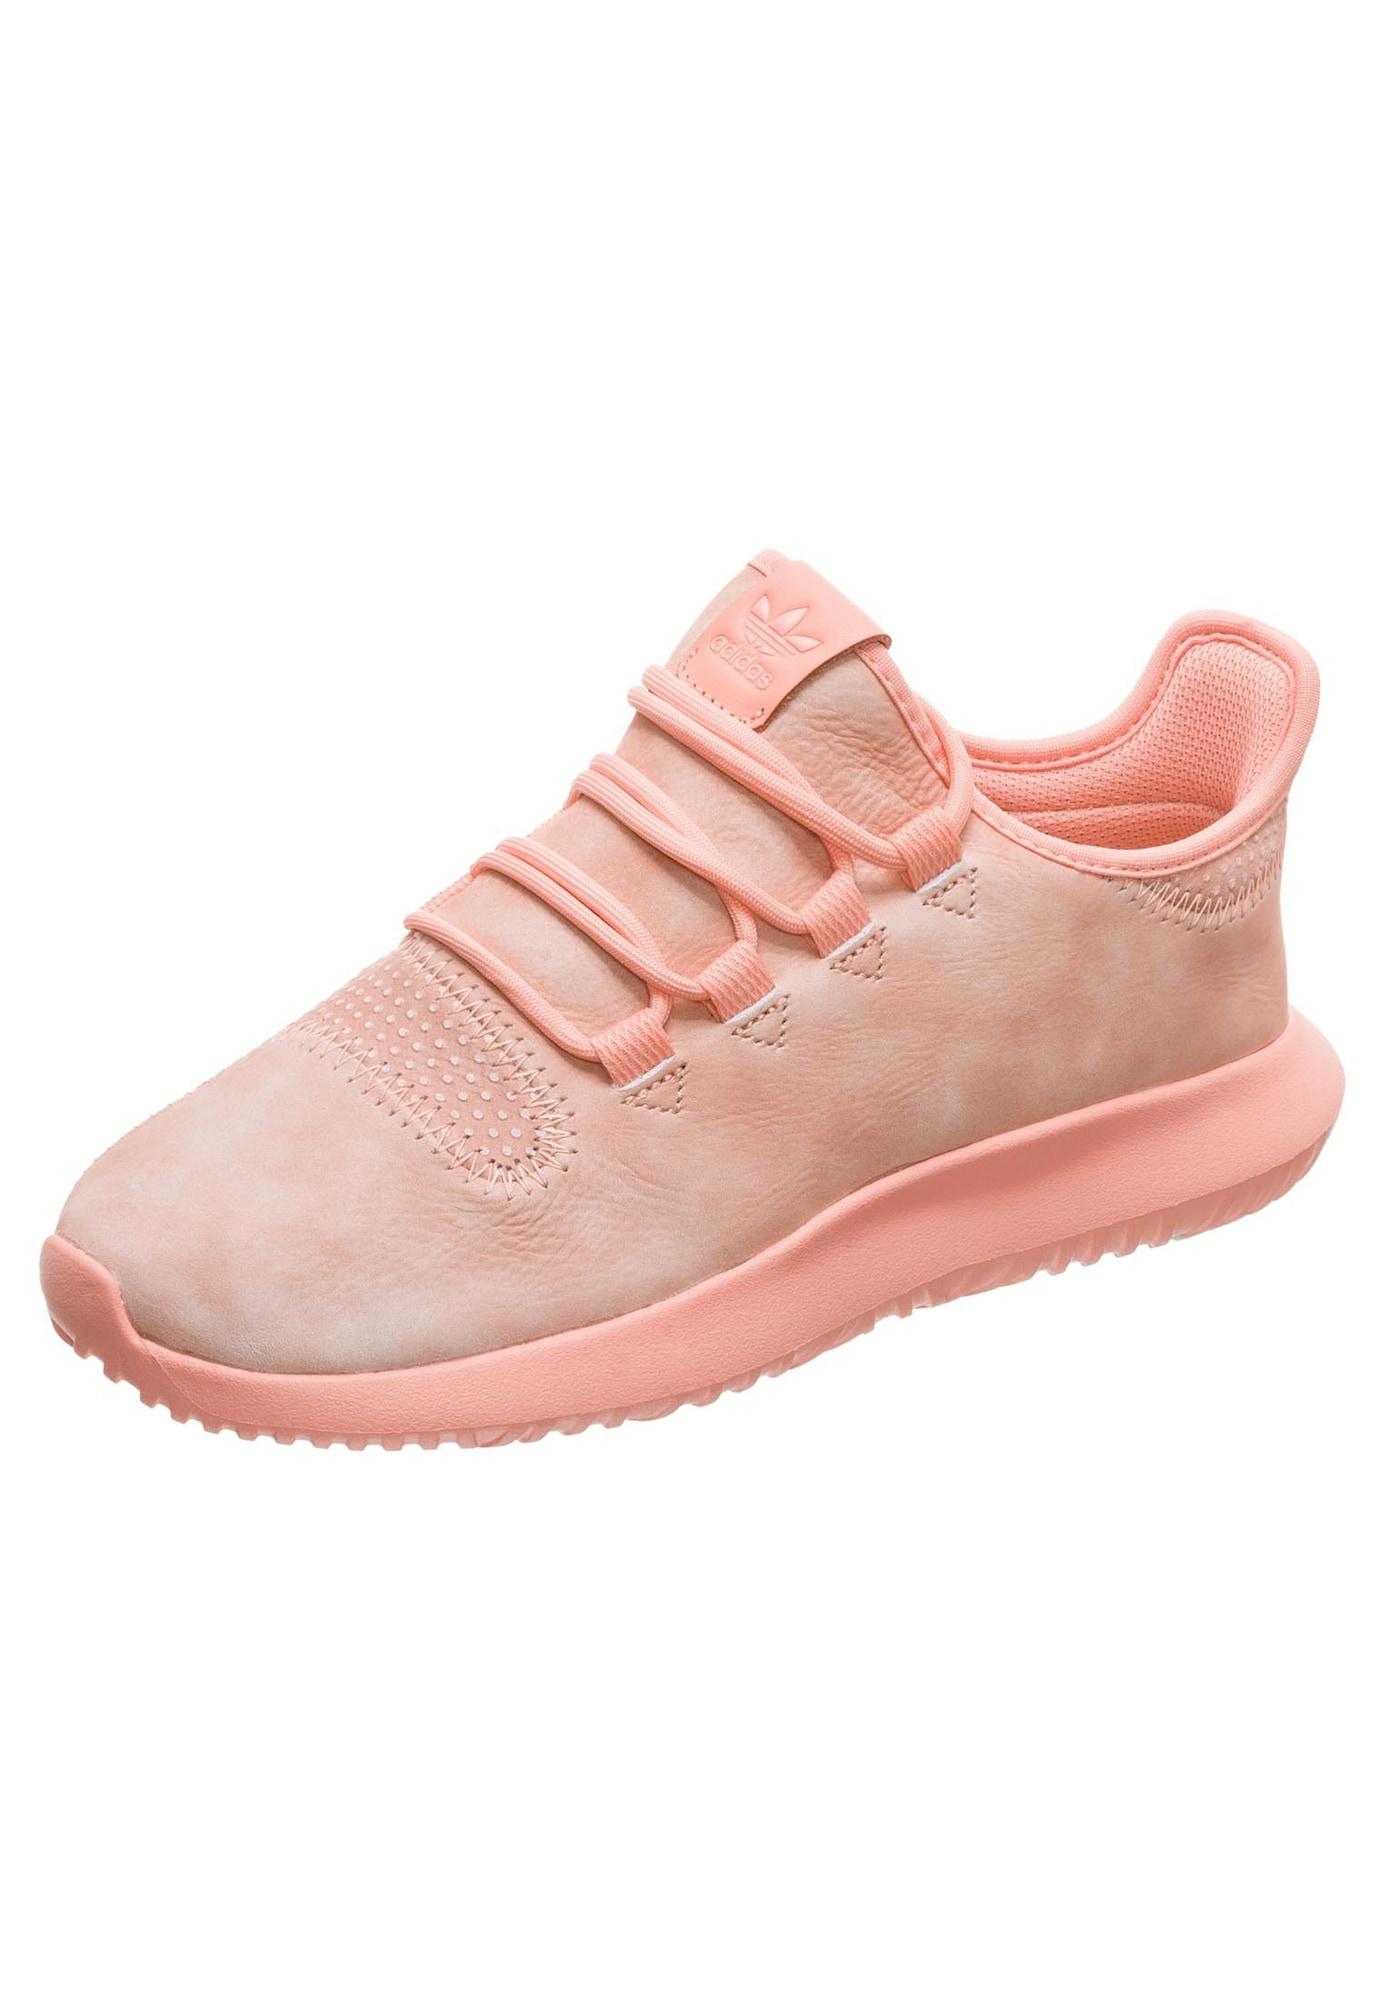 ADIDAS ORIGINALS, Dames Sneakers laag 'Tubular Shadow ', pink